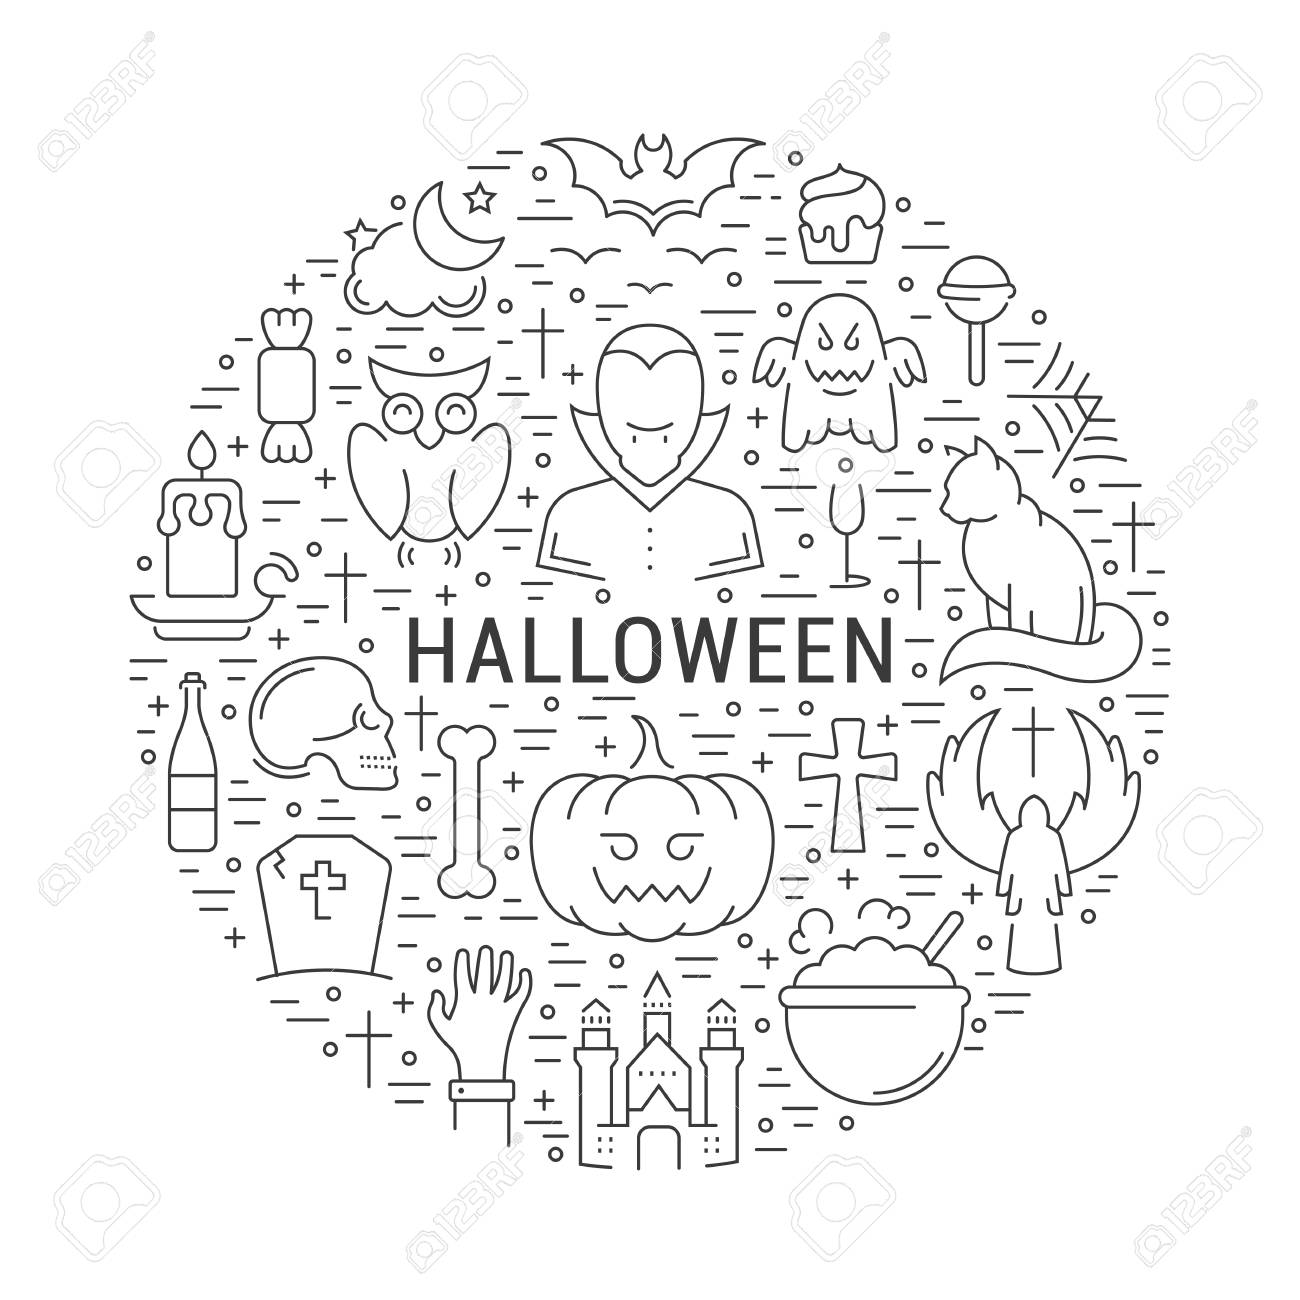 Halloween Concept Template Invitation Symbols Isolated On